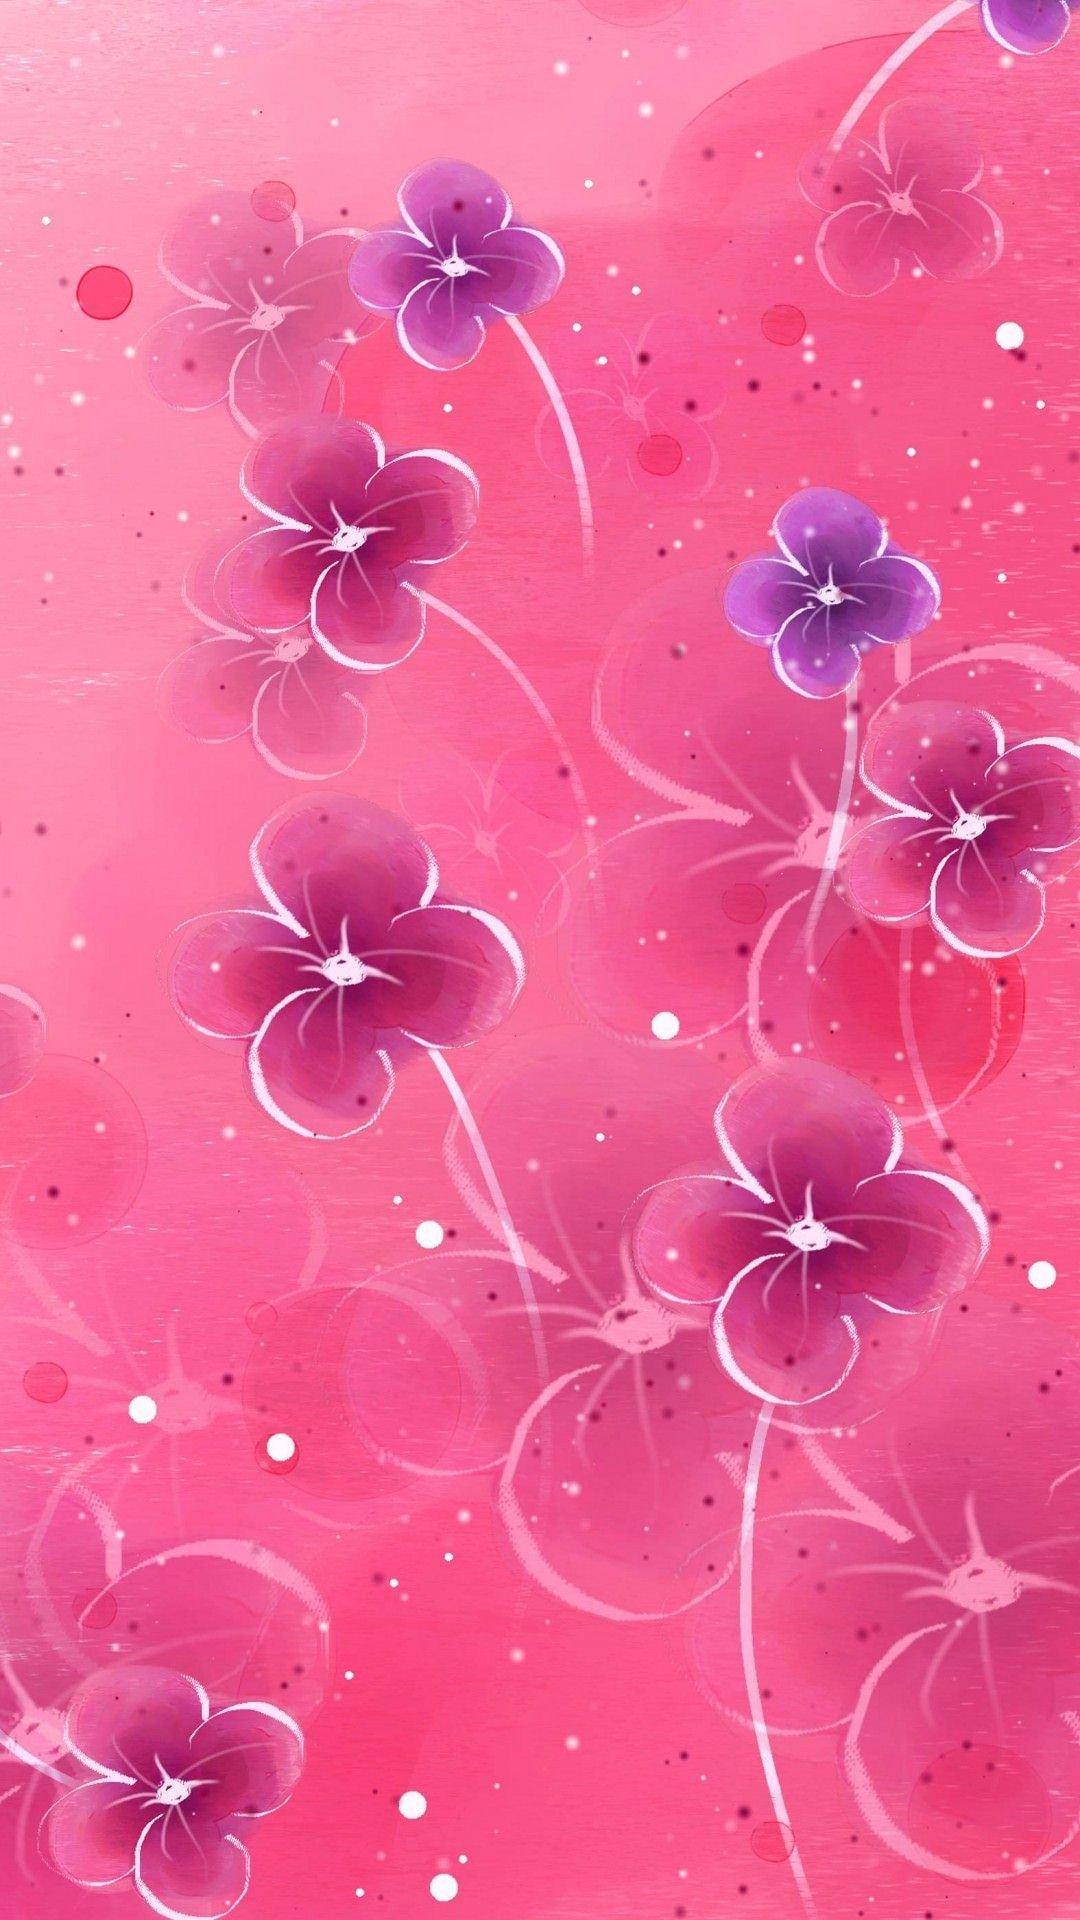 кто-то картинки для телефона цветок на айфон задник также